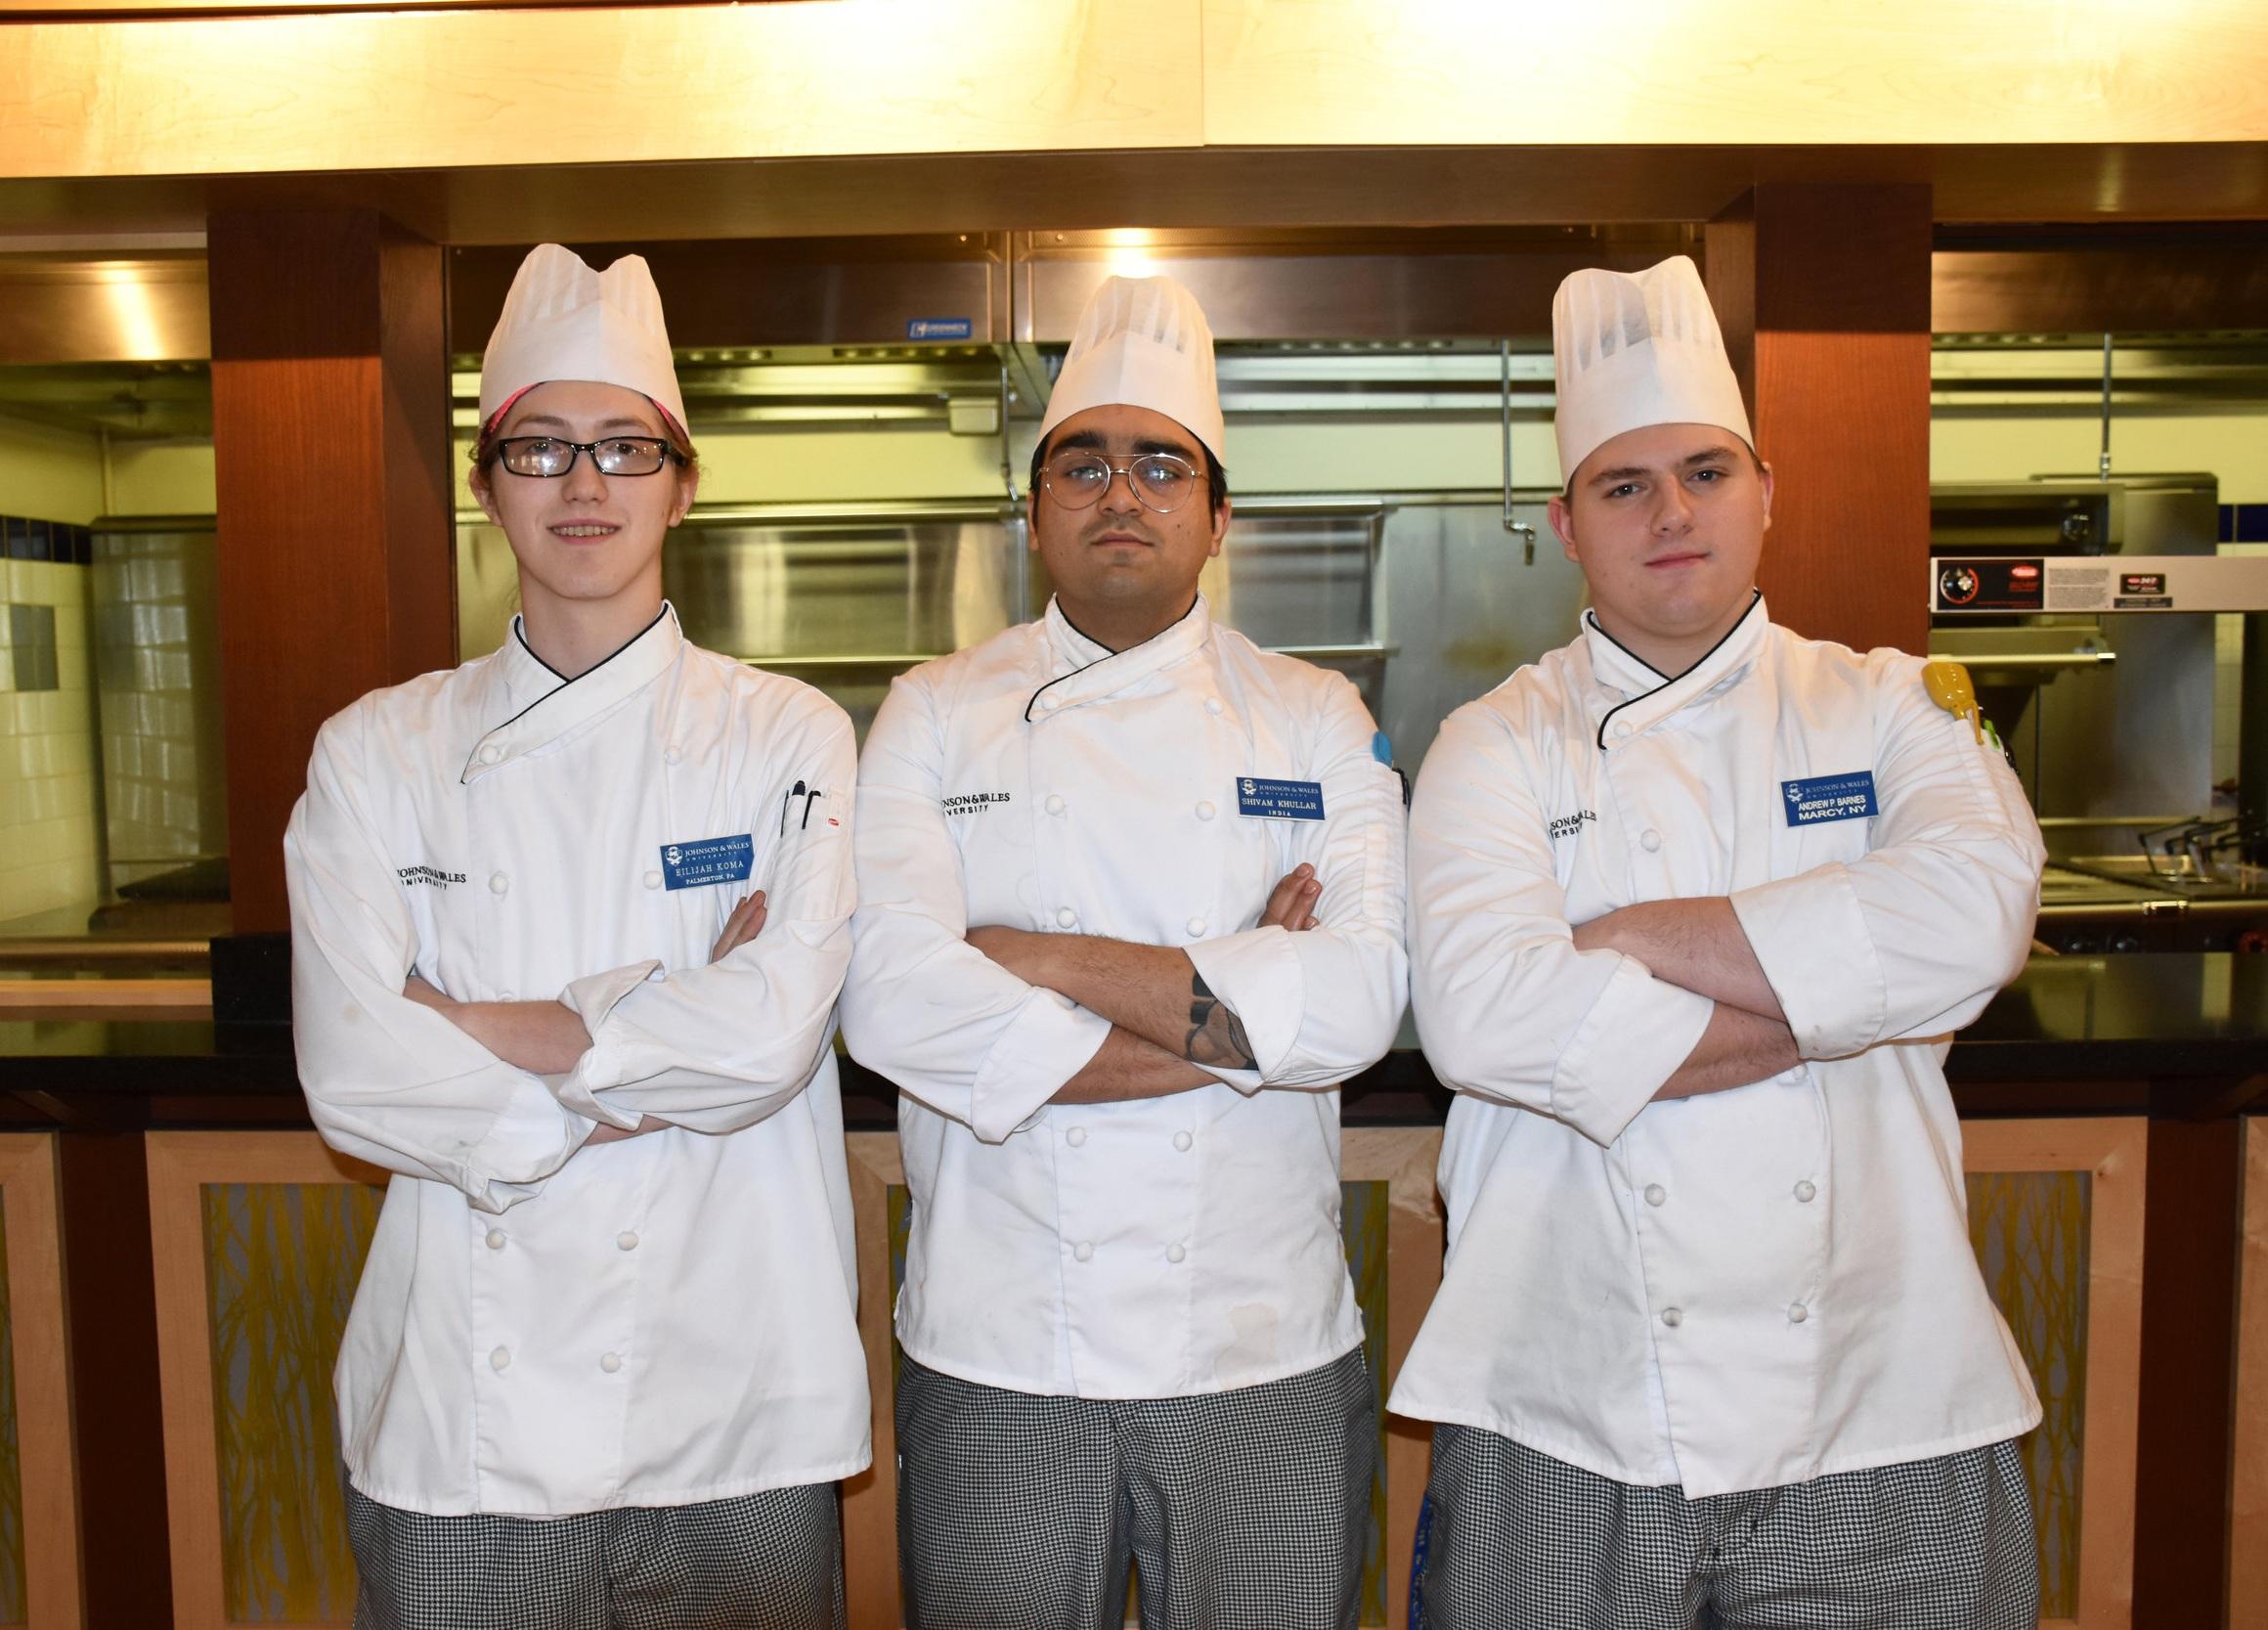 Pork Hand Roll team: Elijah Koma '20, Shivam Khullar '19 and Andrew Barnes '20 (missing from photo is Tyler Glick '20)